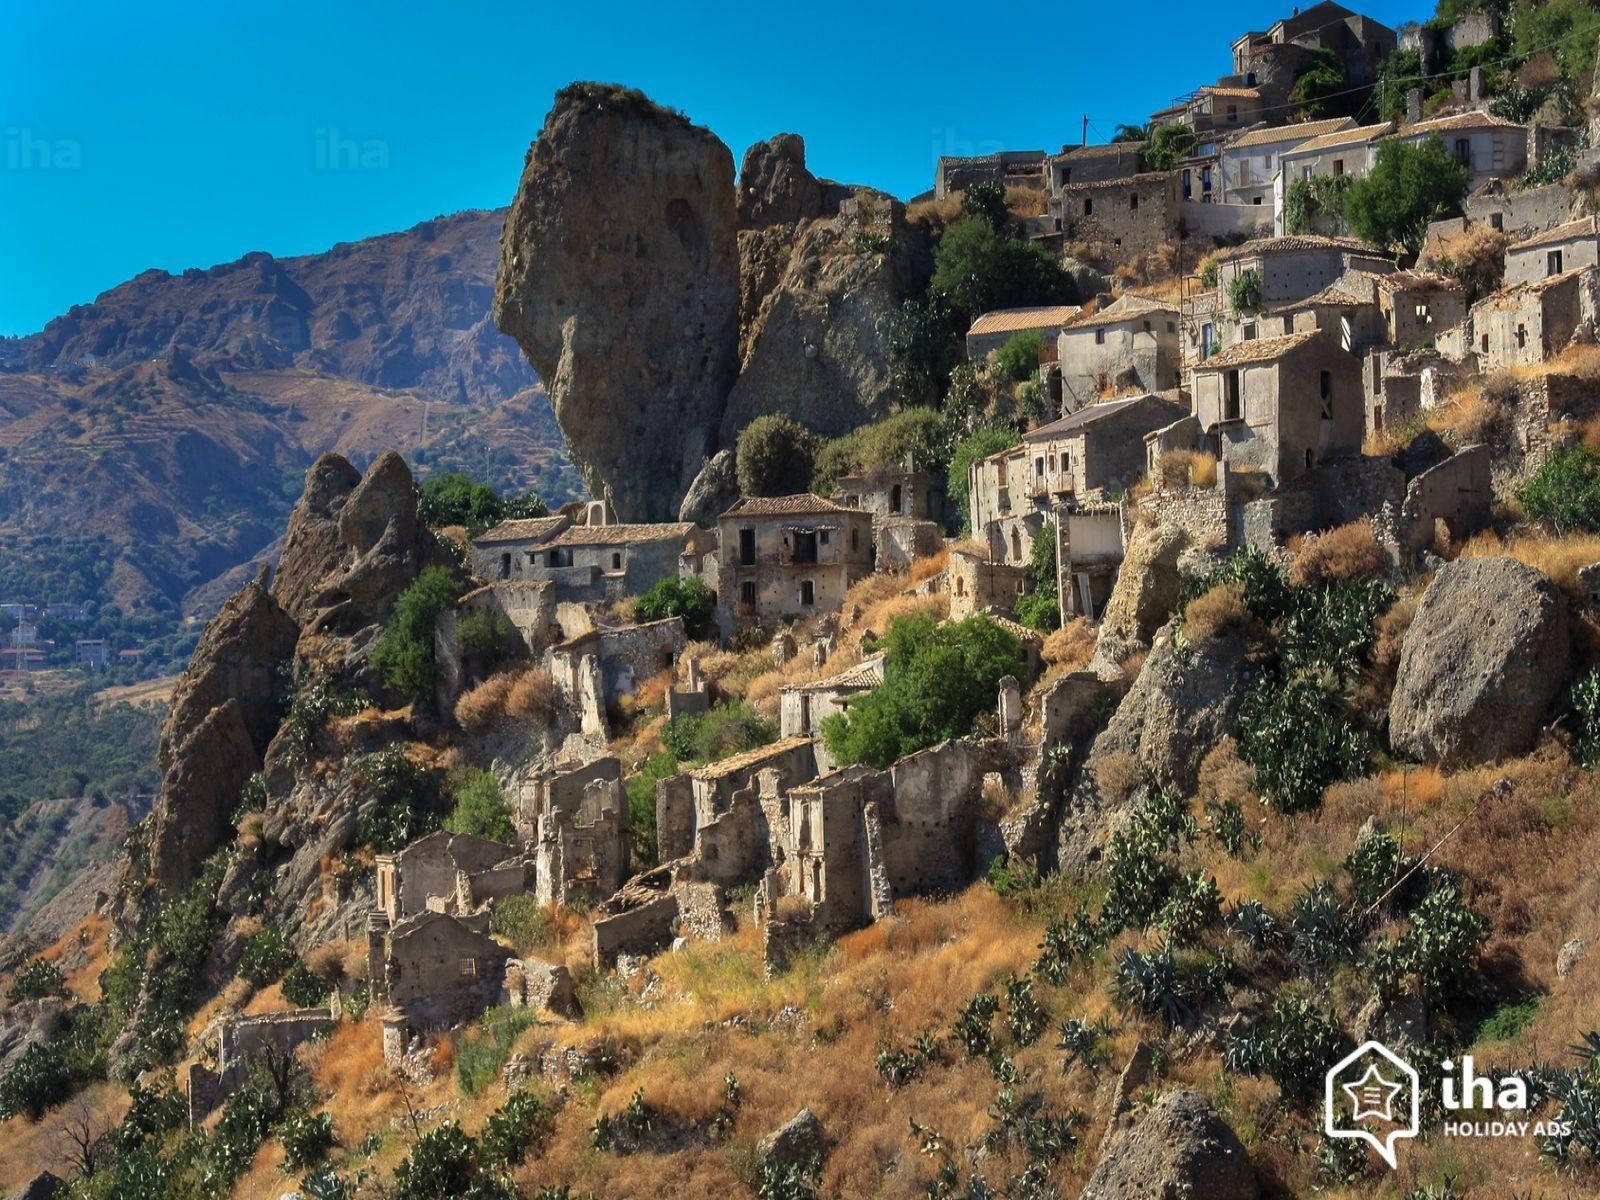 Calabria-Pentedattilo-a-village-of-aspromonte